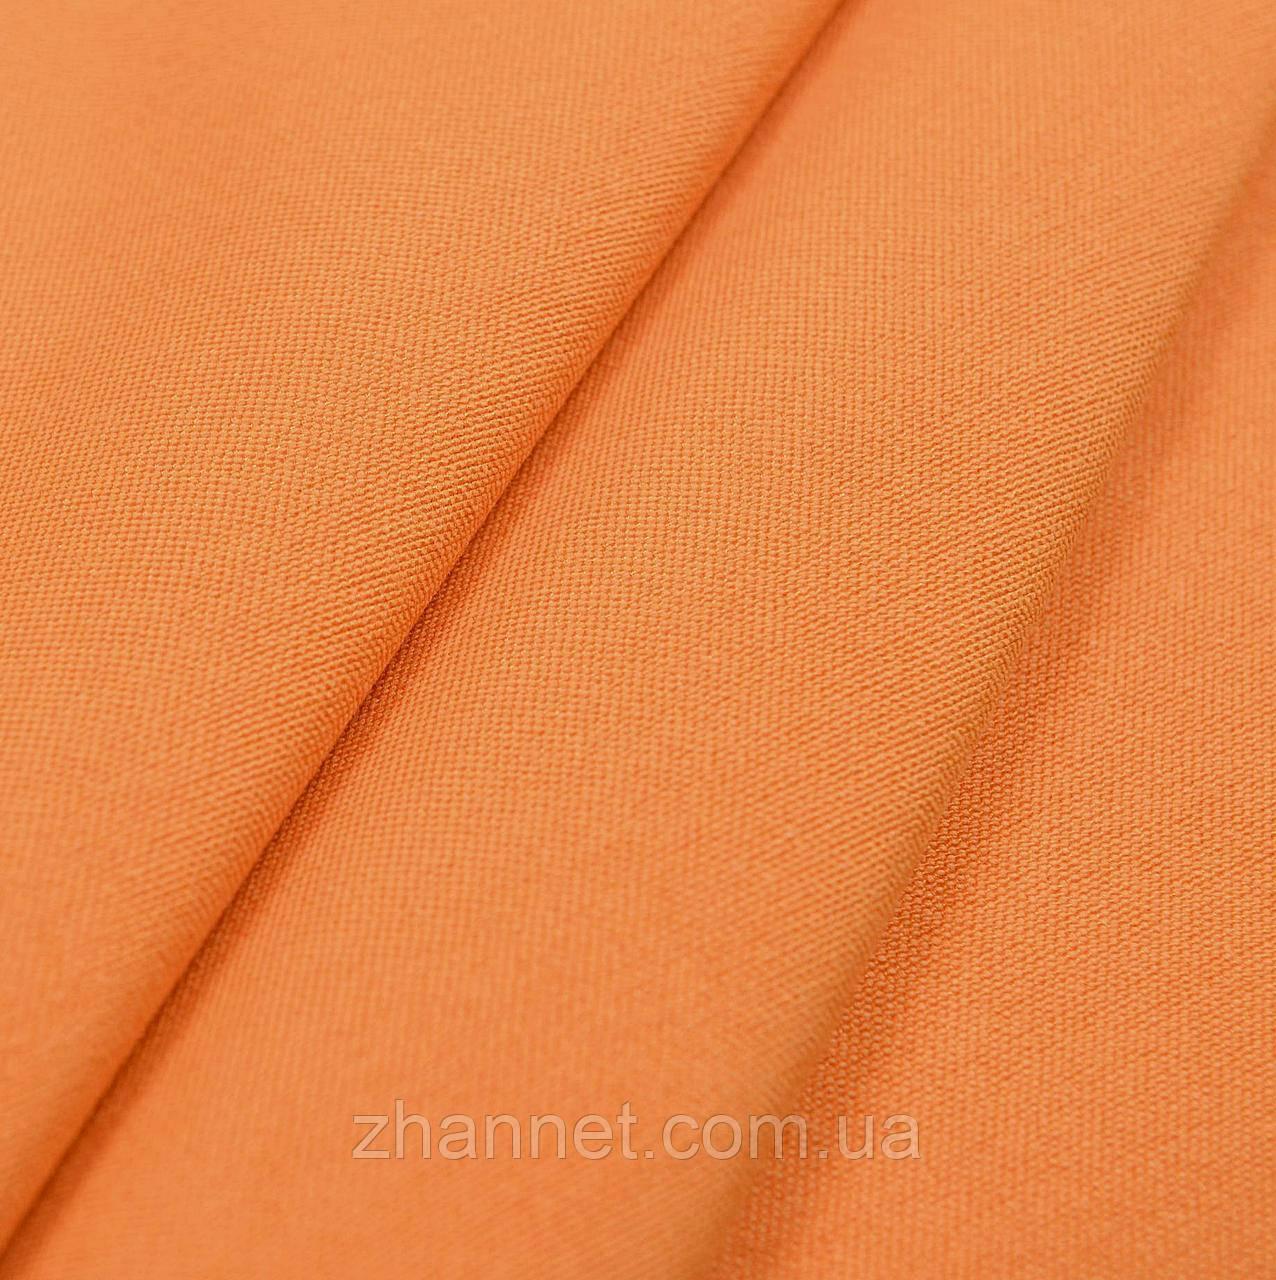 Ткань для штор Kanzas оранжевый